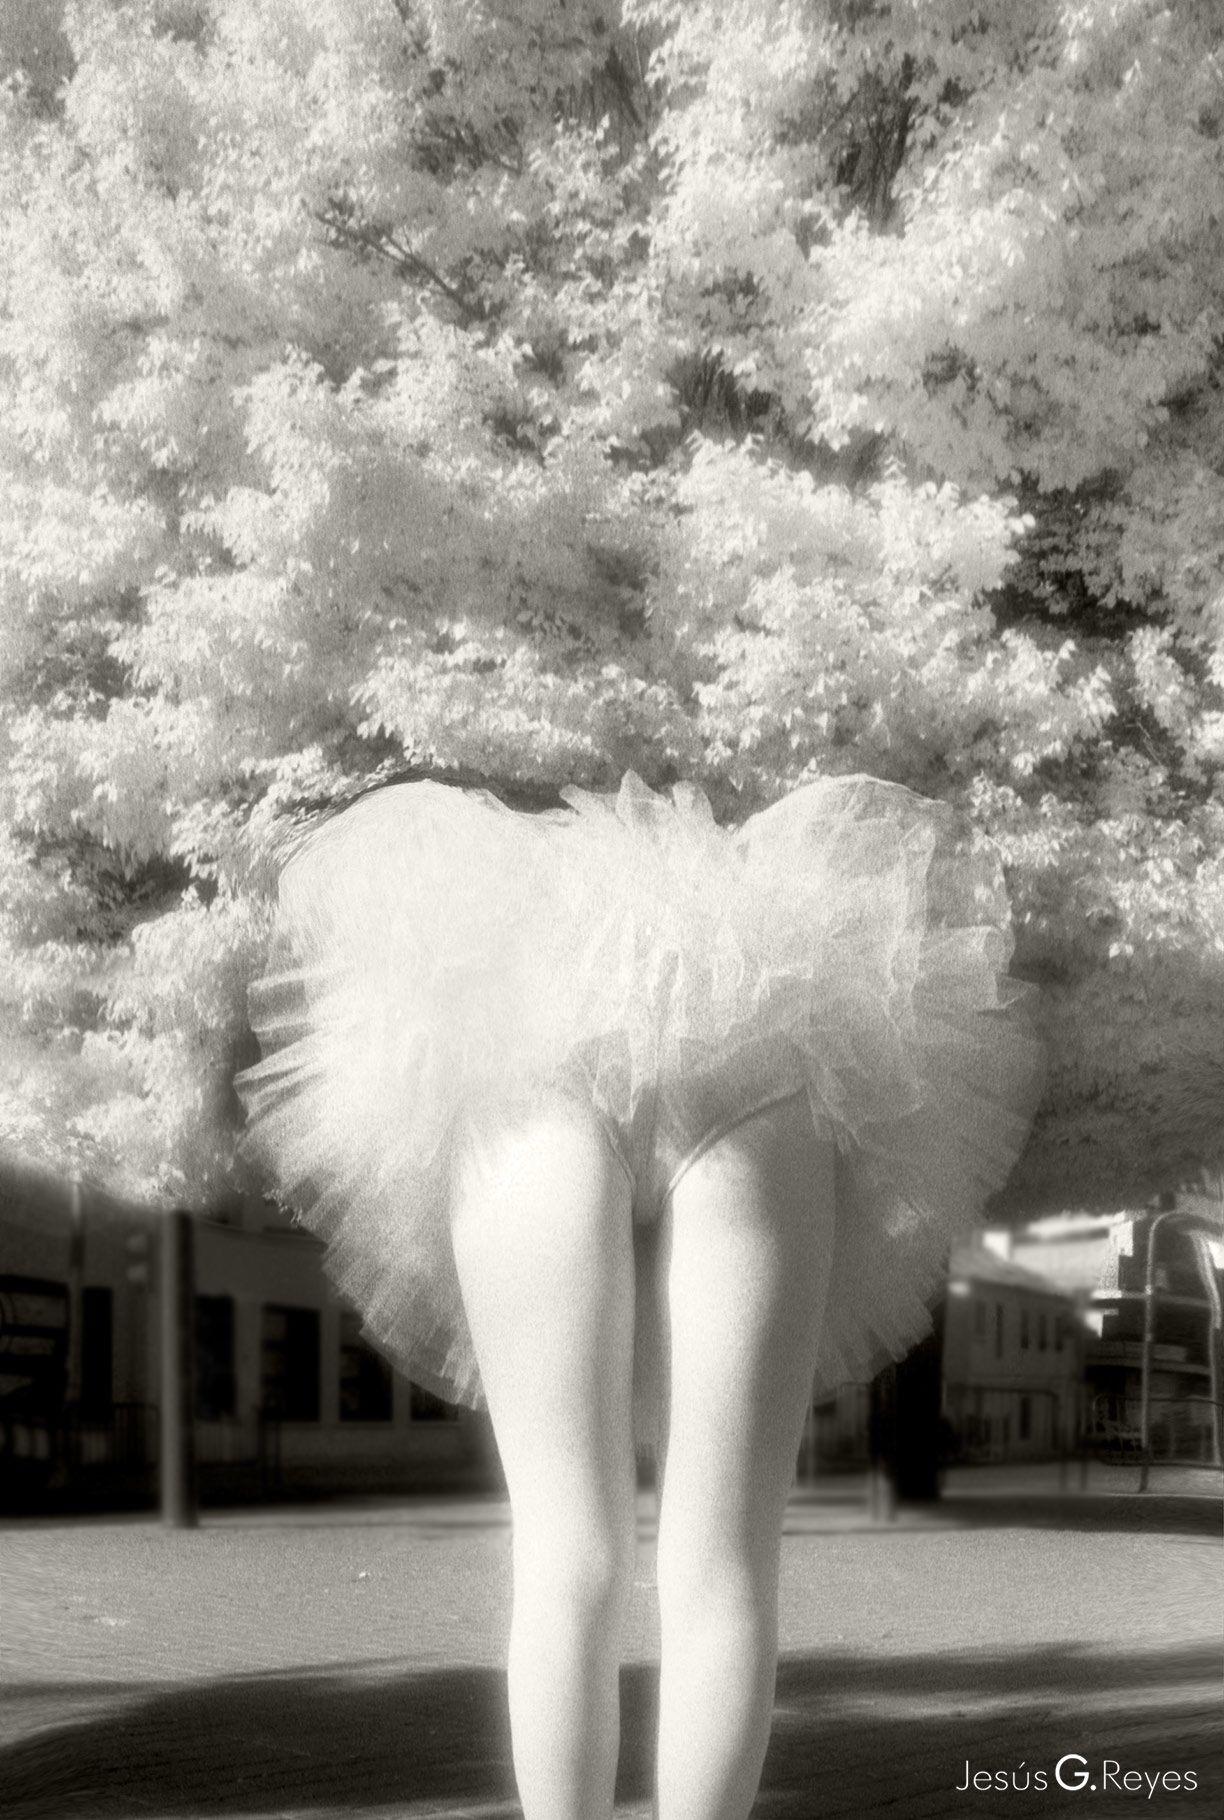 1st Prize. IV Photo Contest. Julio Cortazar. Madrid